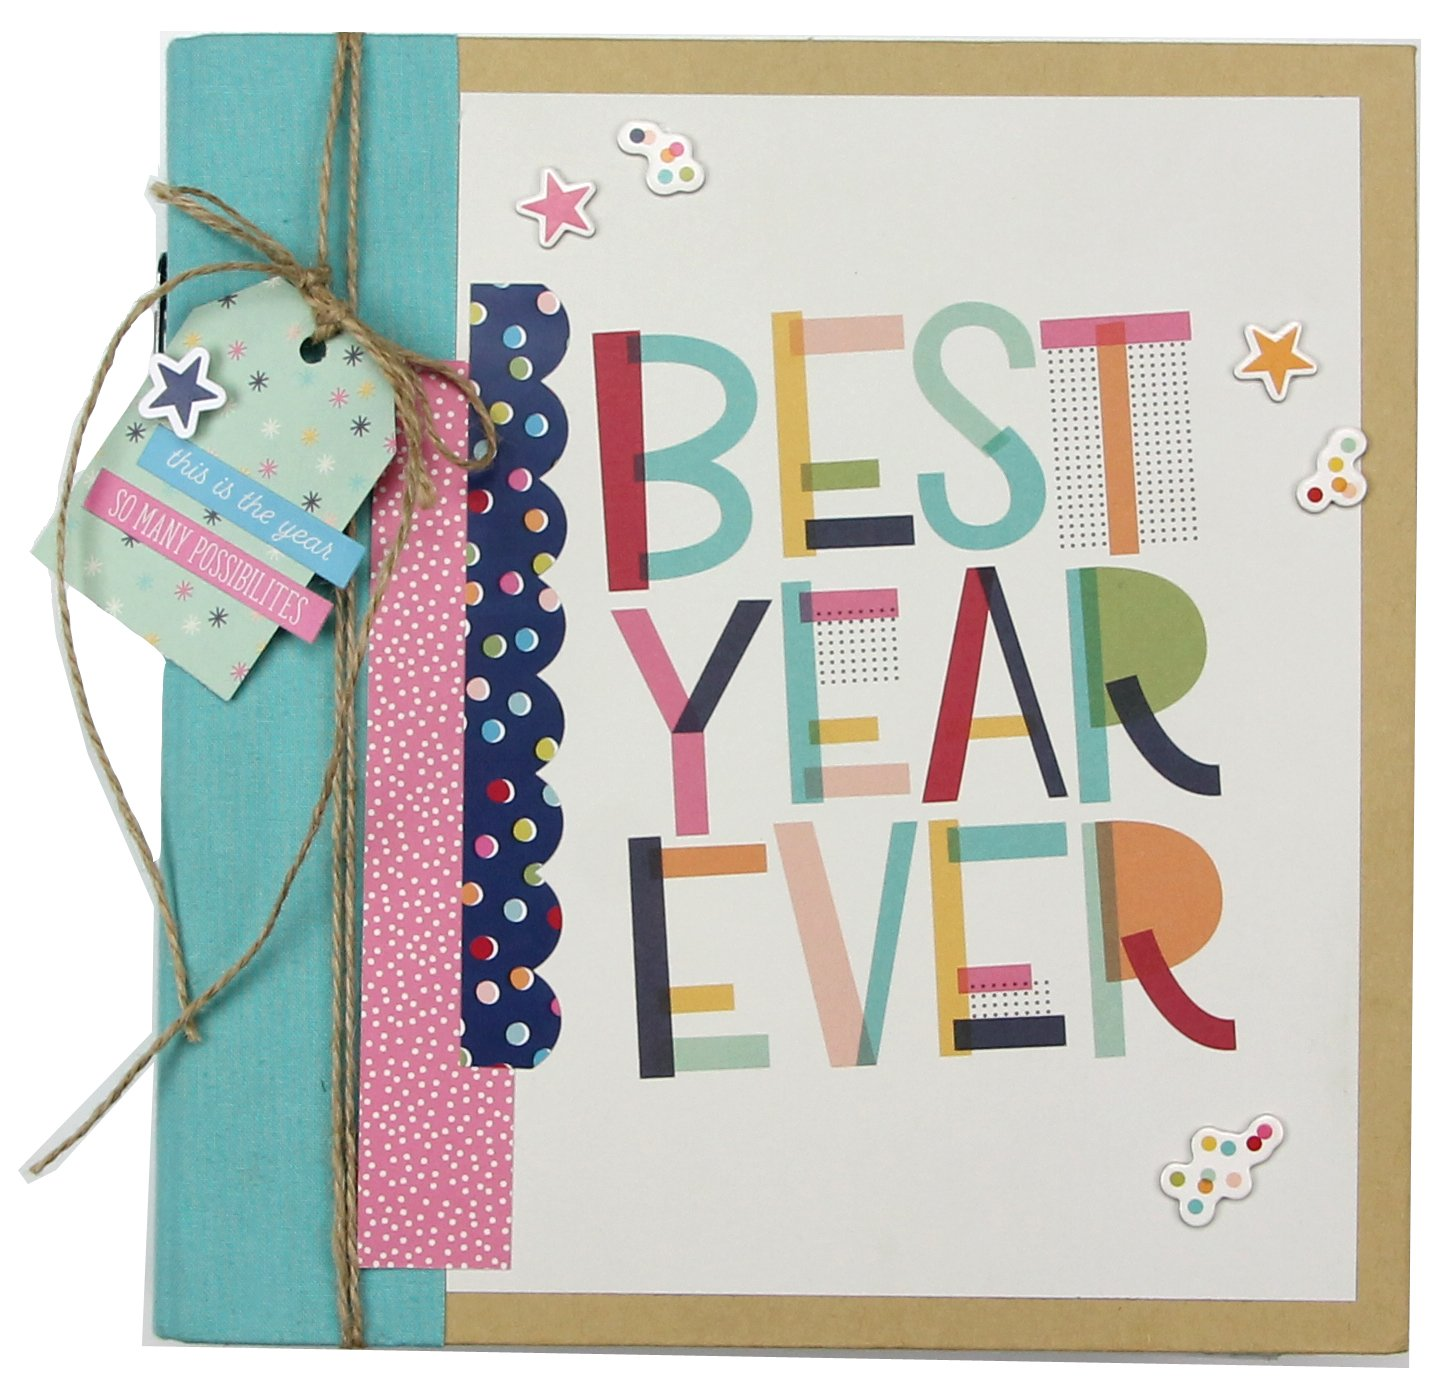 Best Year Ever Mini Album Kit